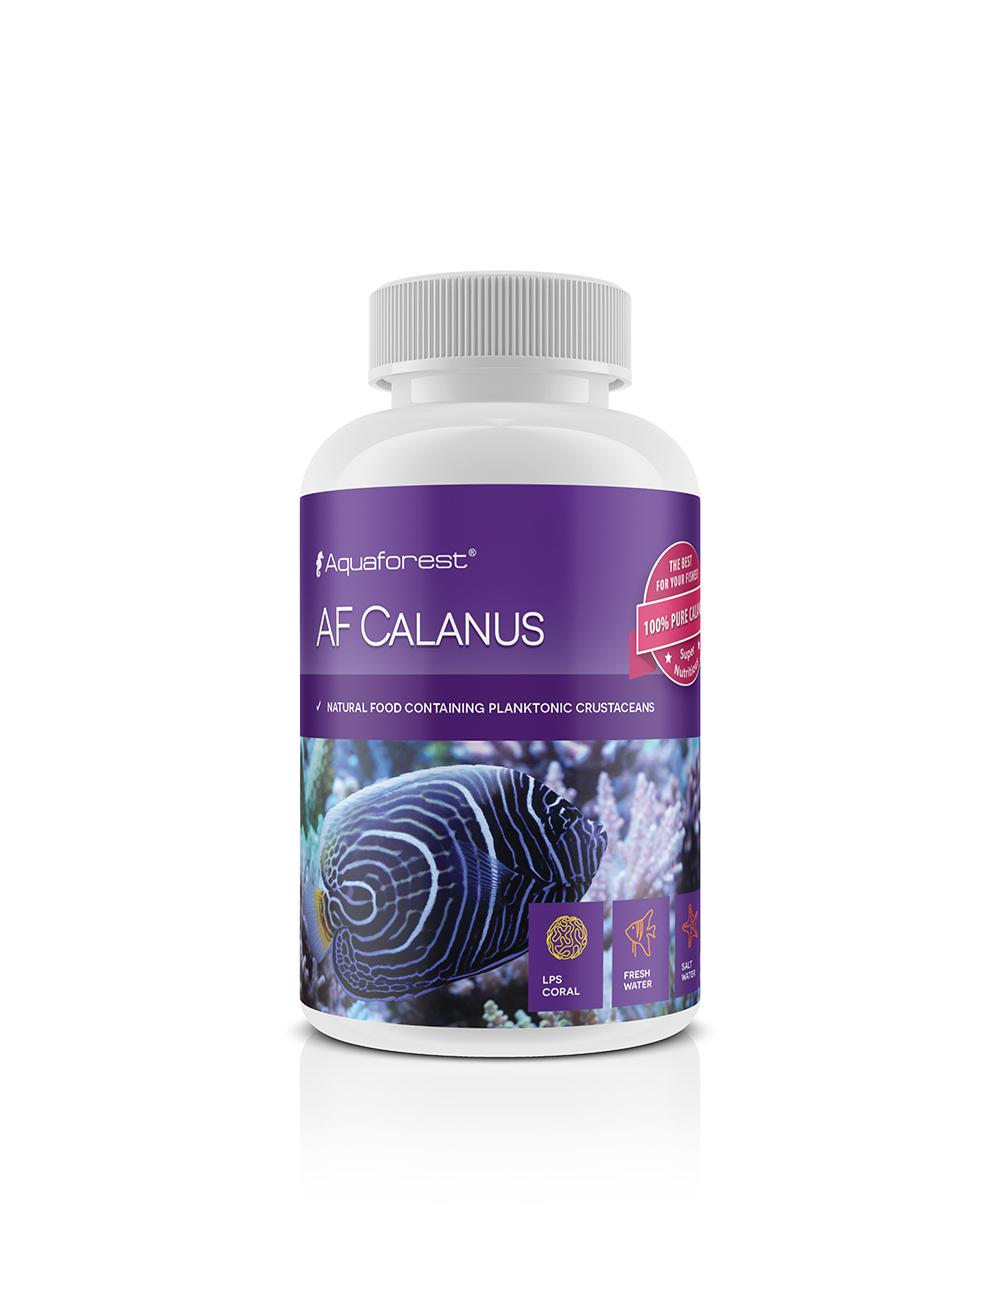 AQUAFOREST - AF Calanus - 15g - NOUVEAU